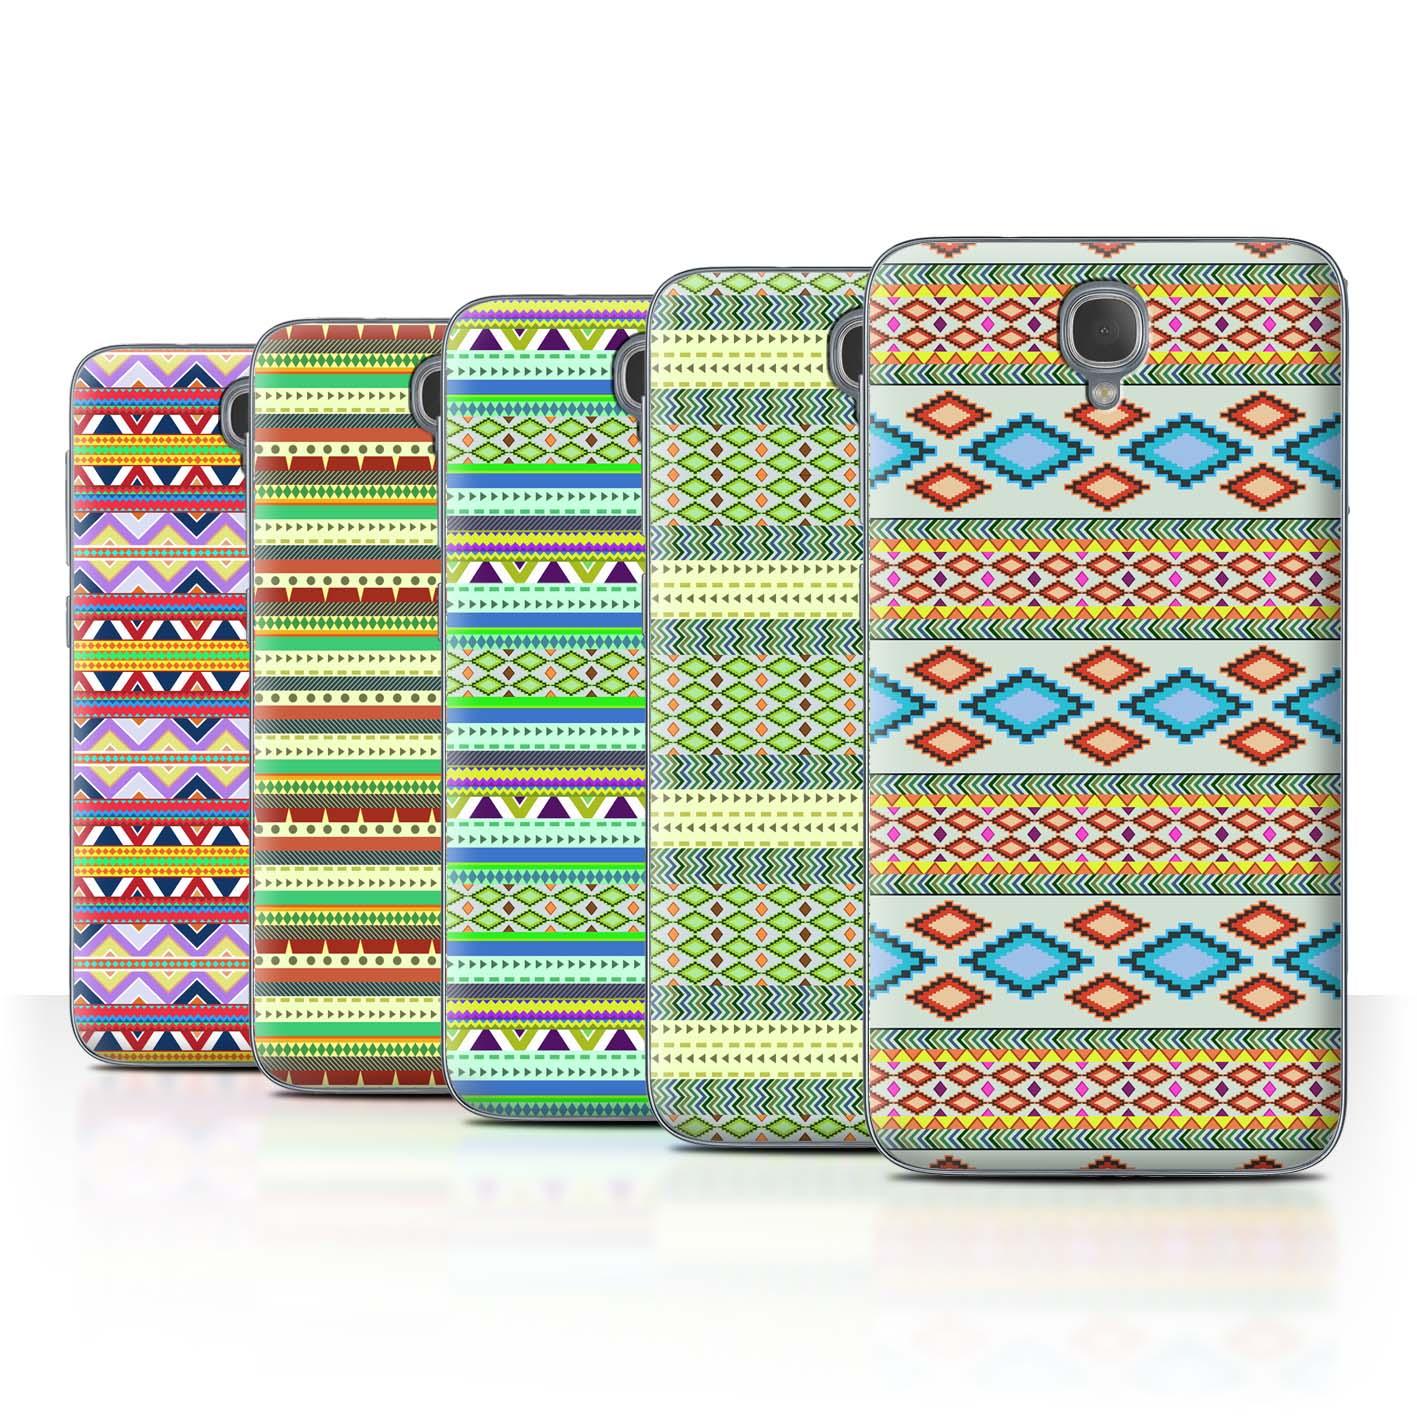 STUFF4-Back-Case-Cover-Skin-for-Alcatel-Idol-2-Aztec-Tribal-Pattern